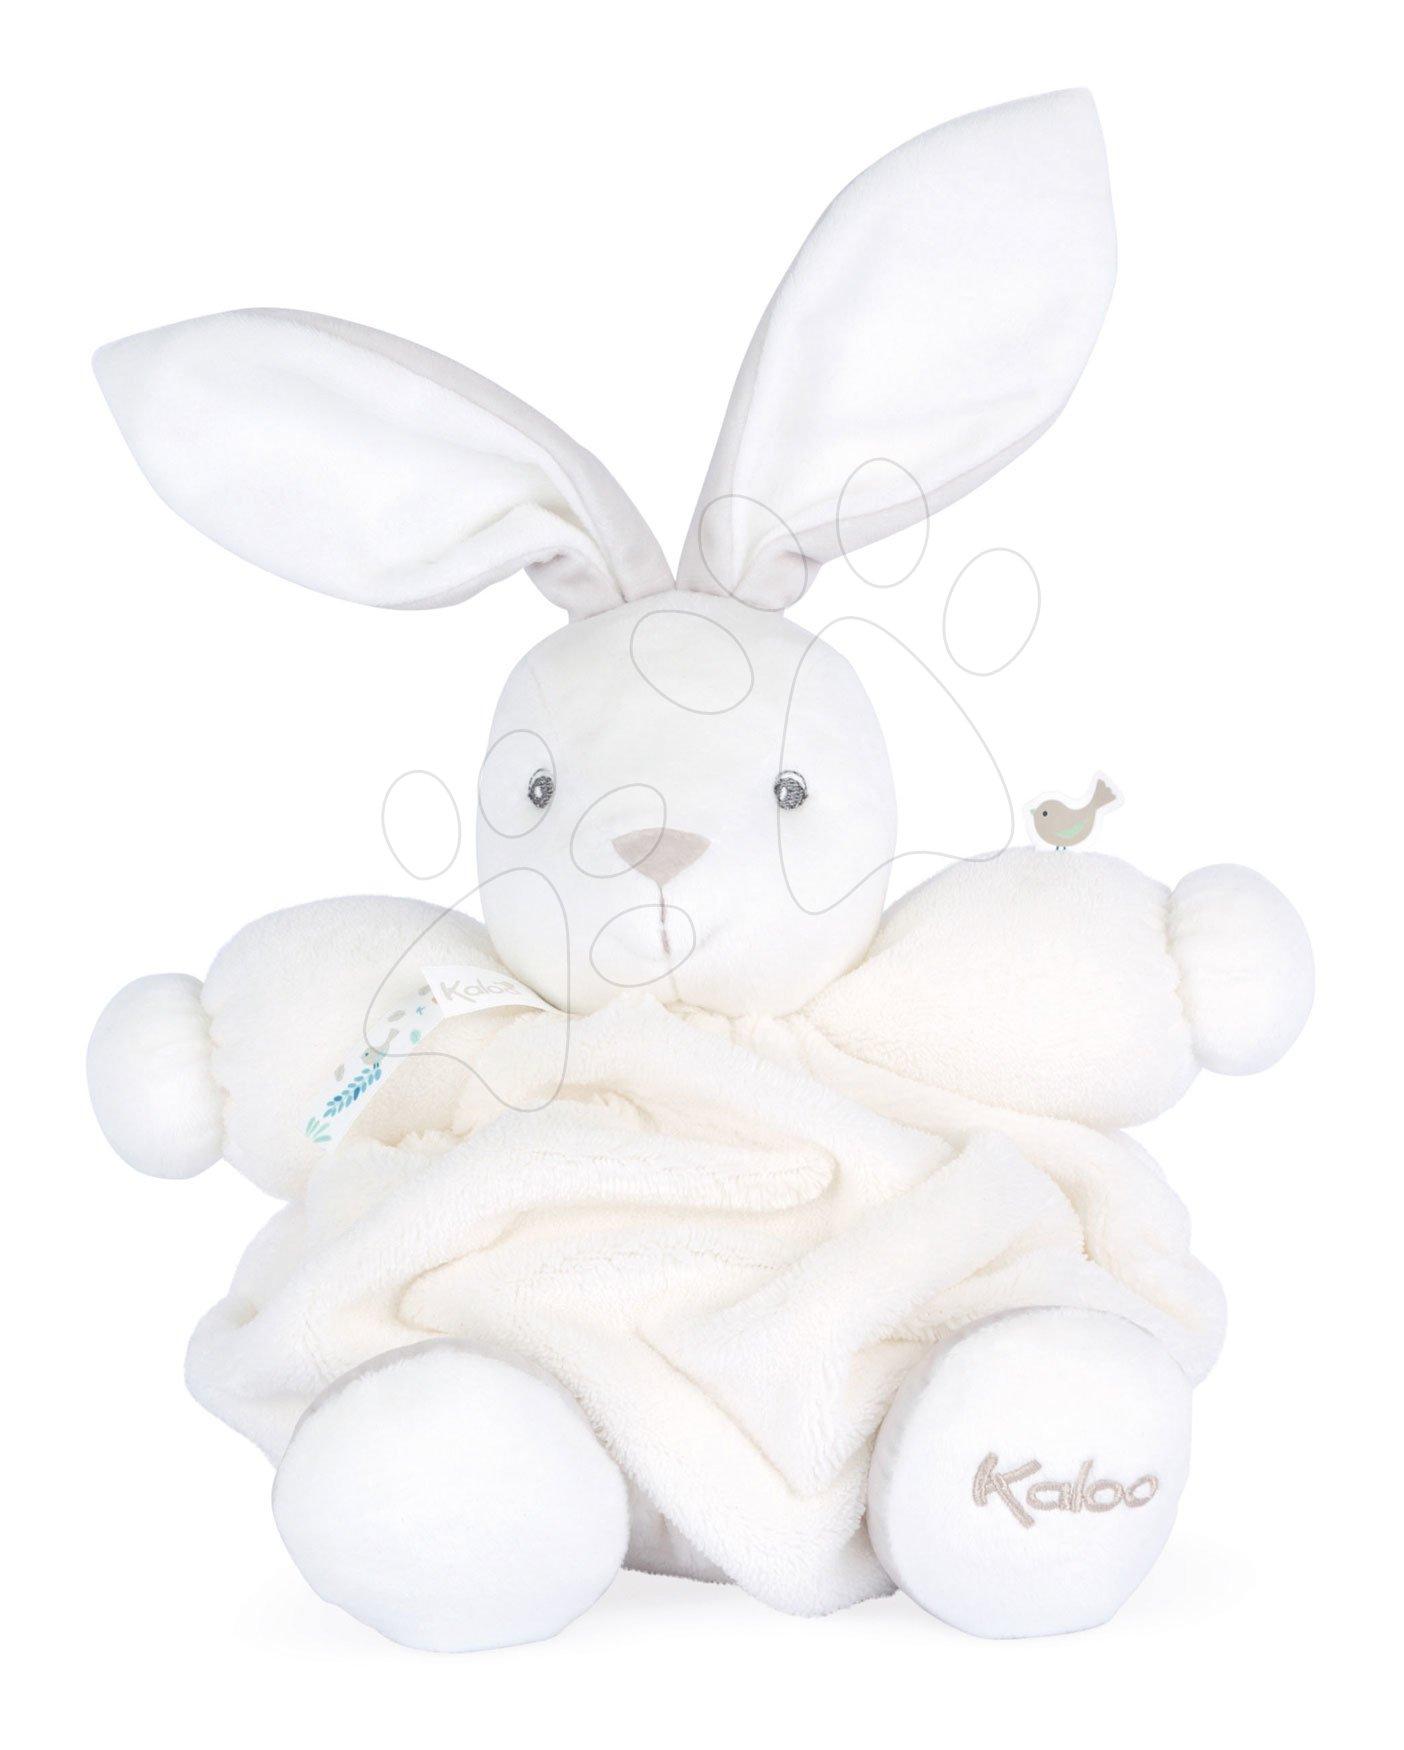 Plyšový zajačik Chubby Rabbit Ivory Plume Kaloo biely 25 cm z jemného mäkkého materiálu v darčekovom balení od 0 mes